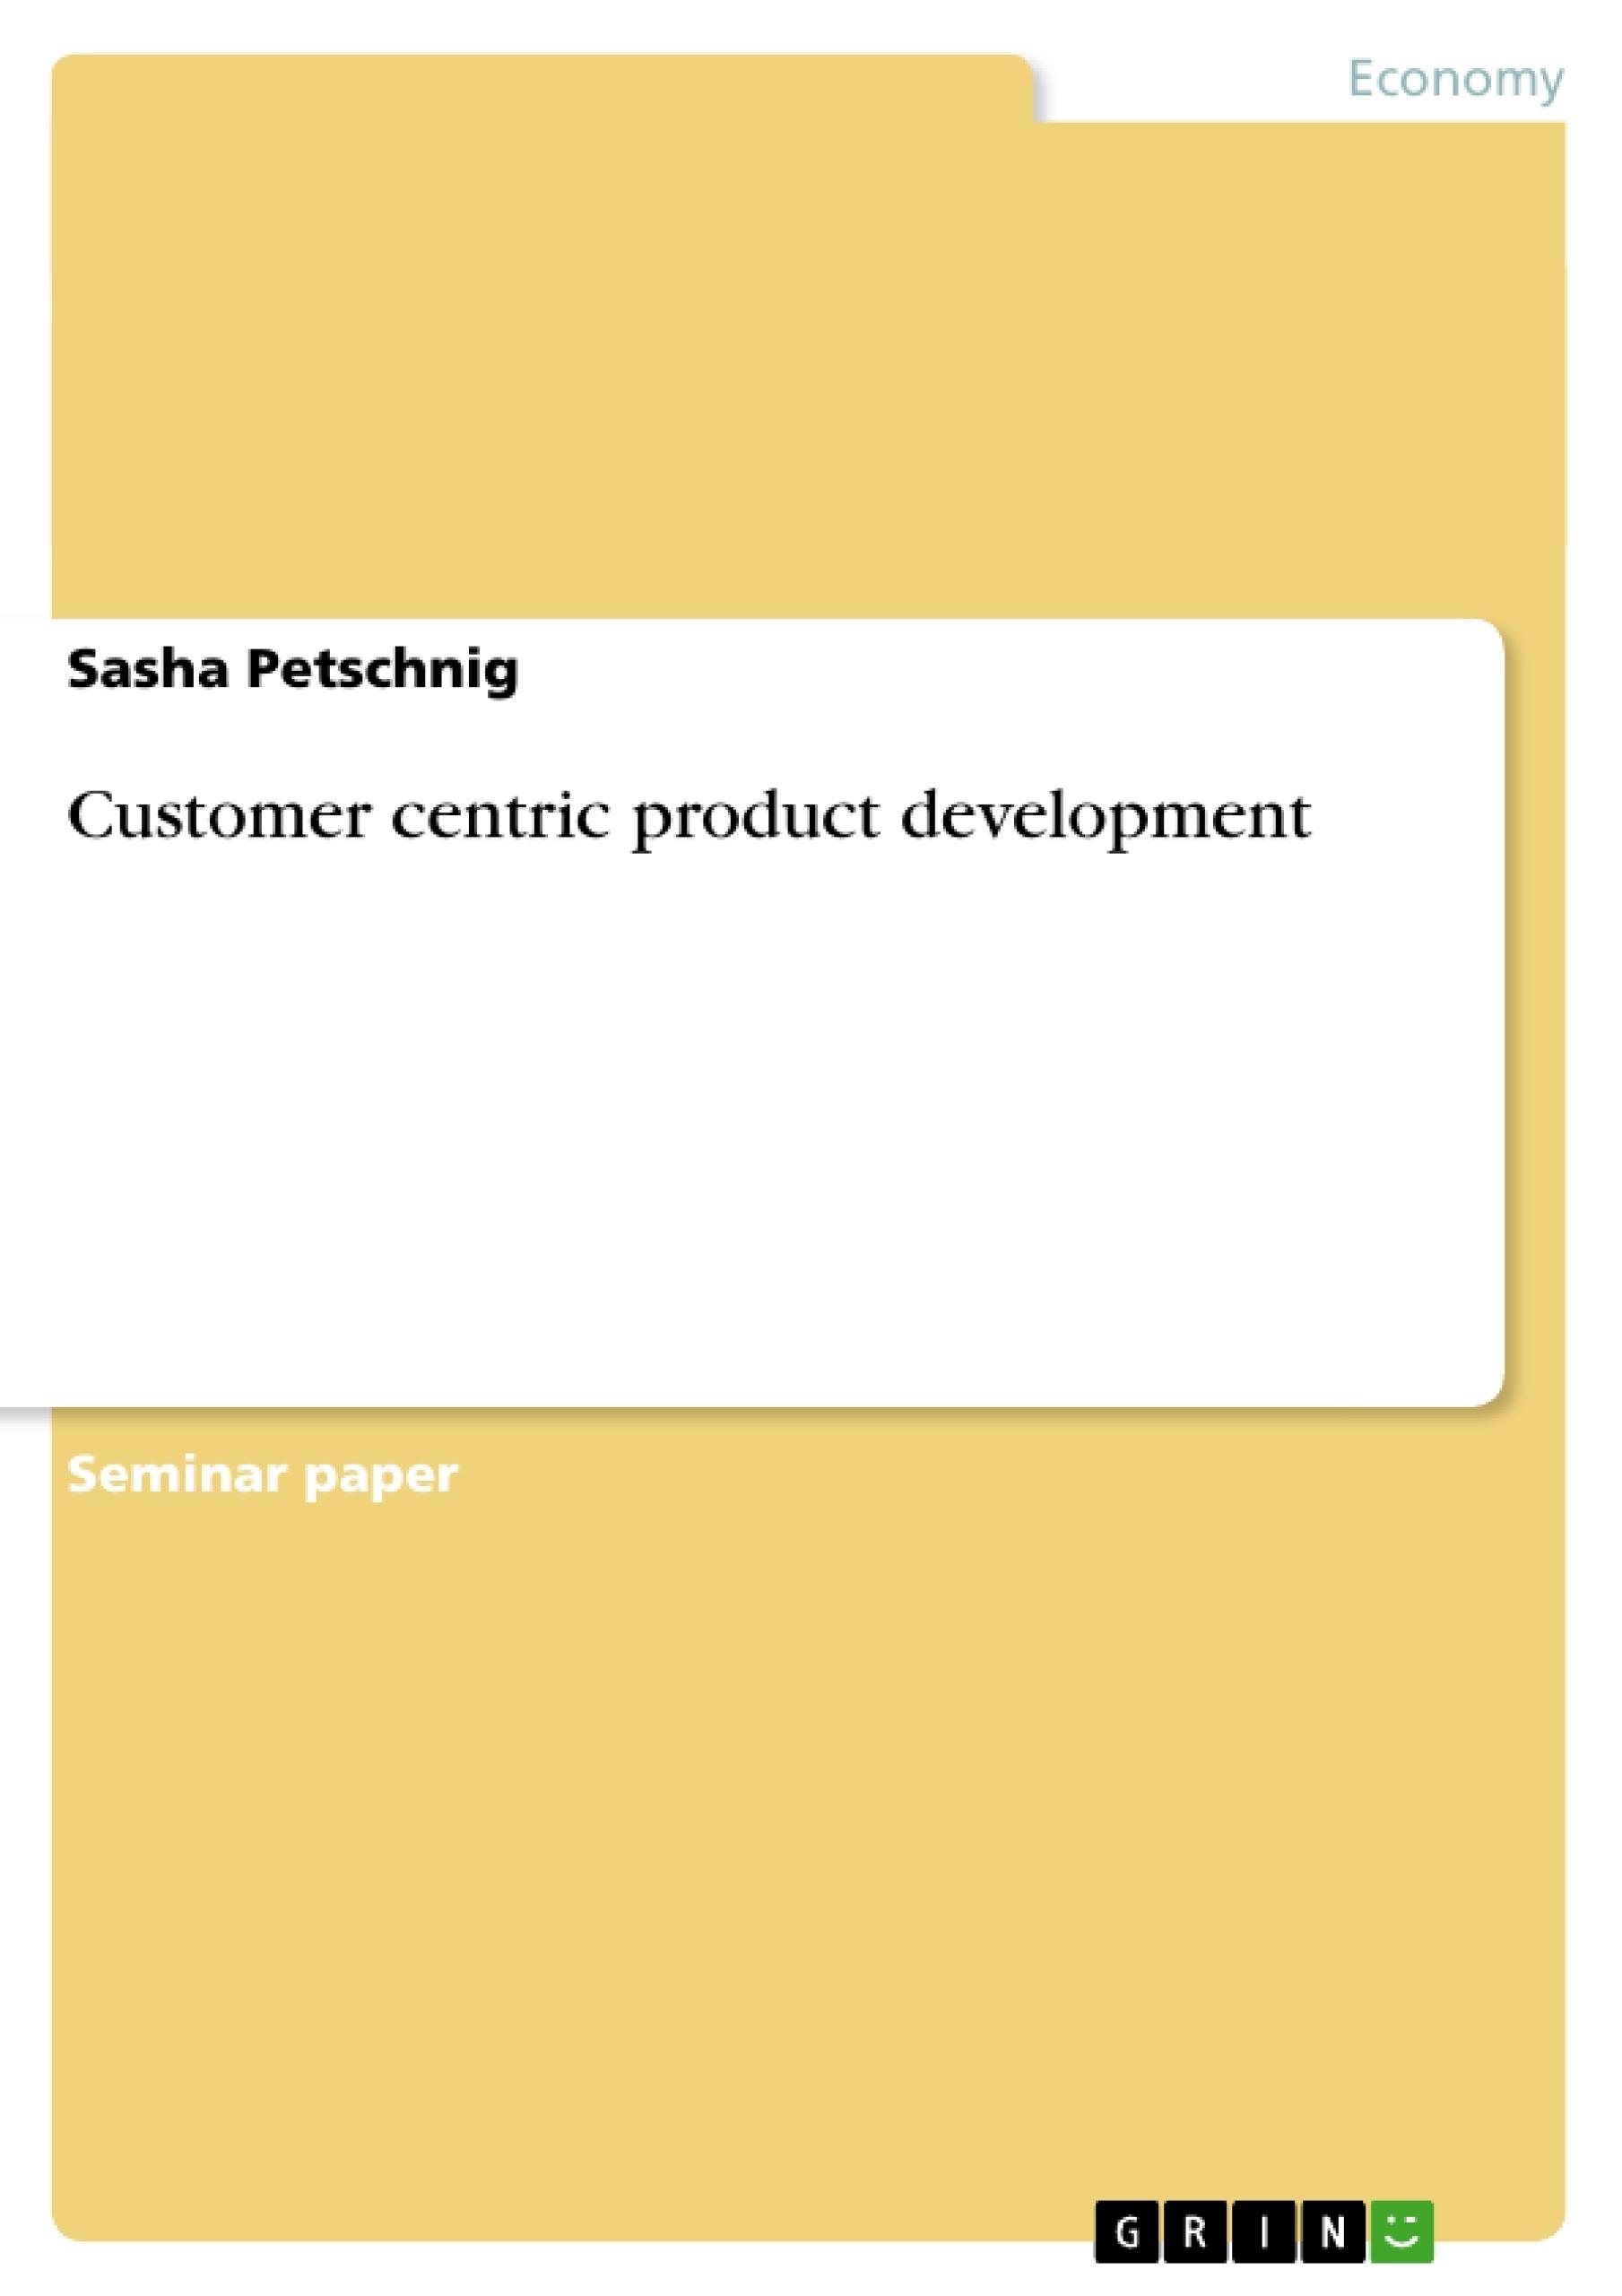 Title: Customer centric product development